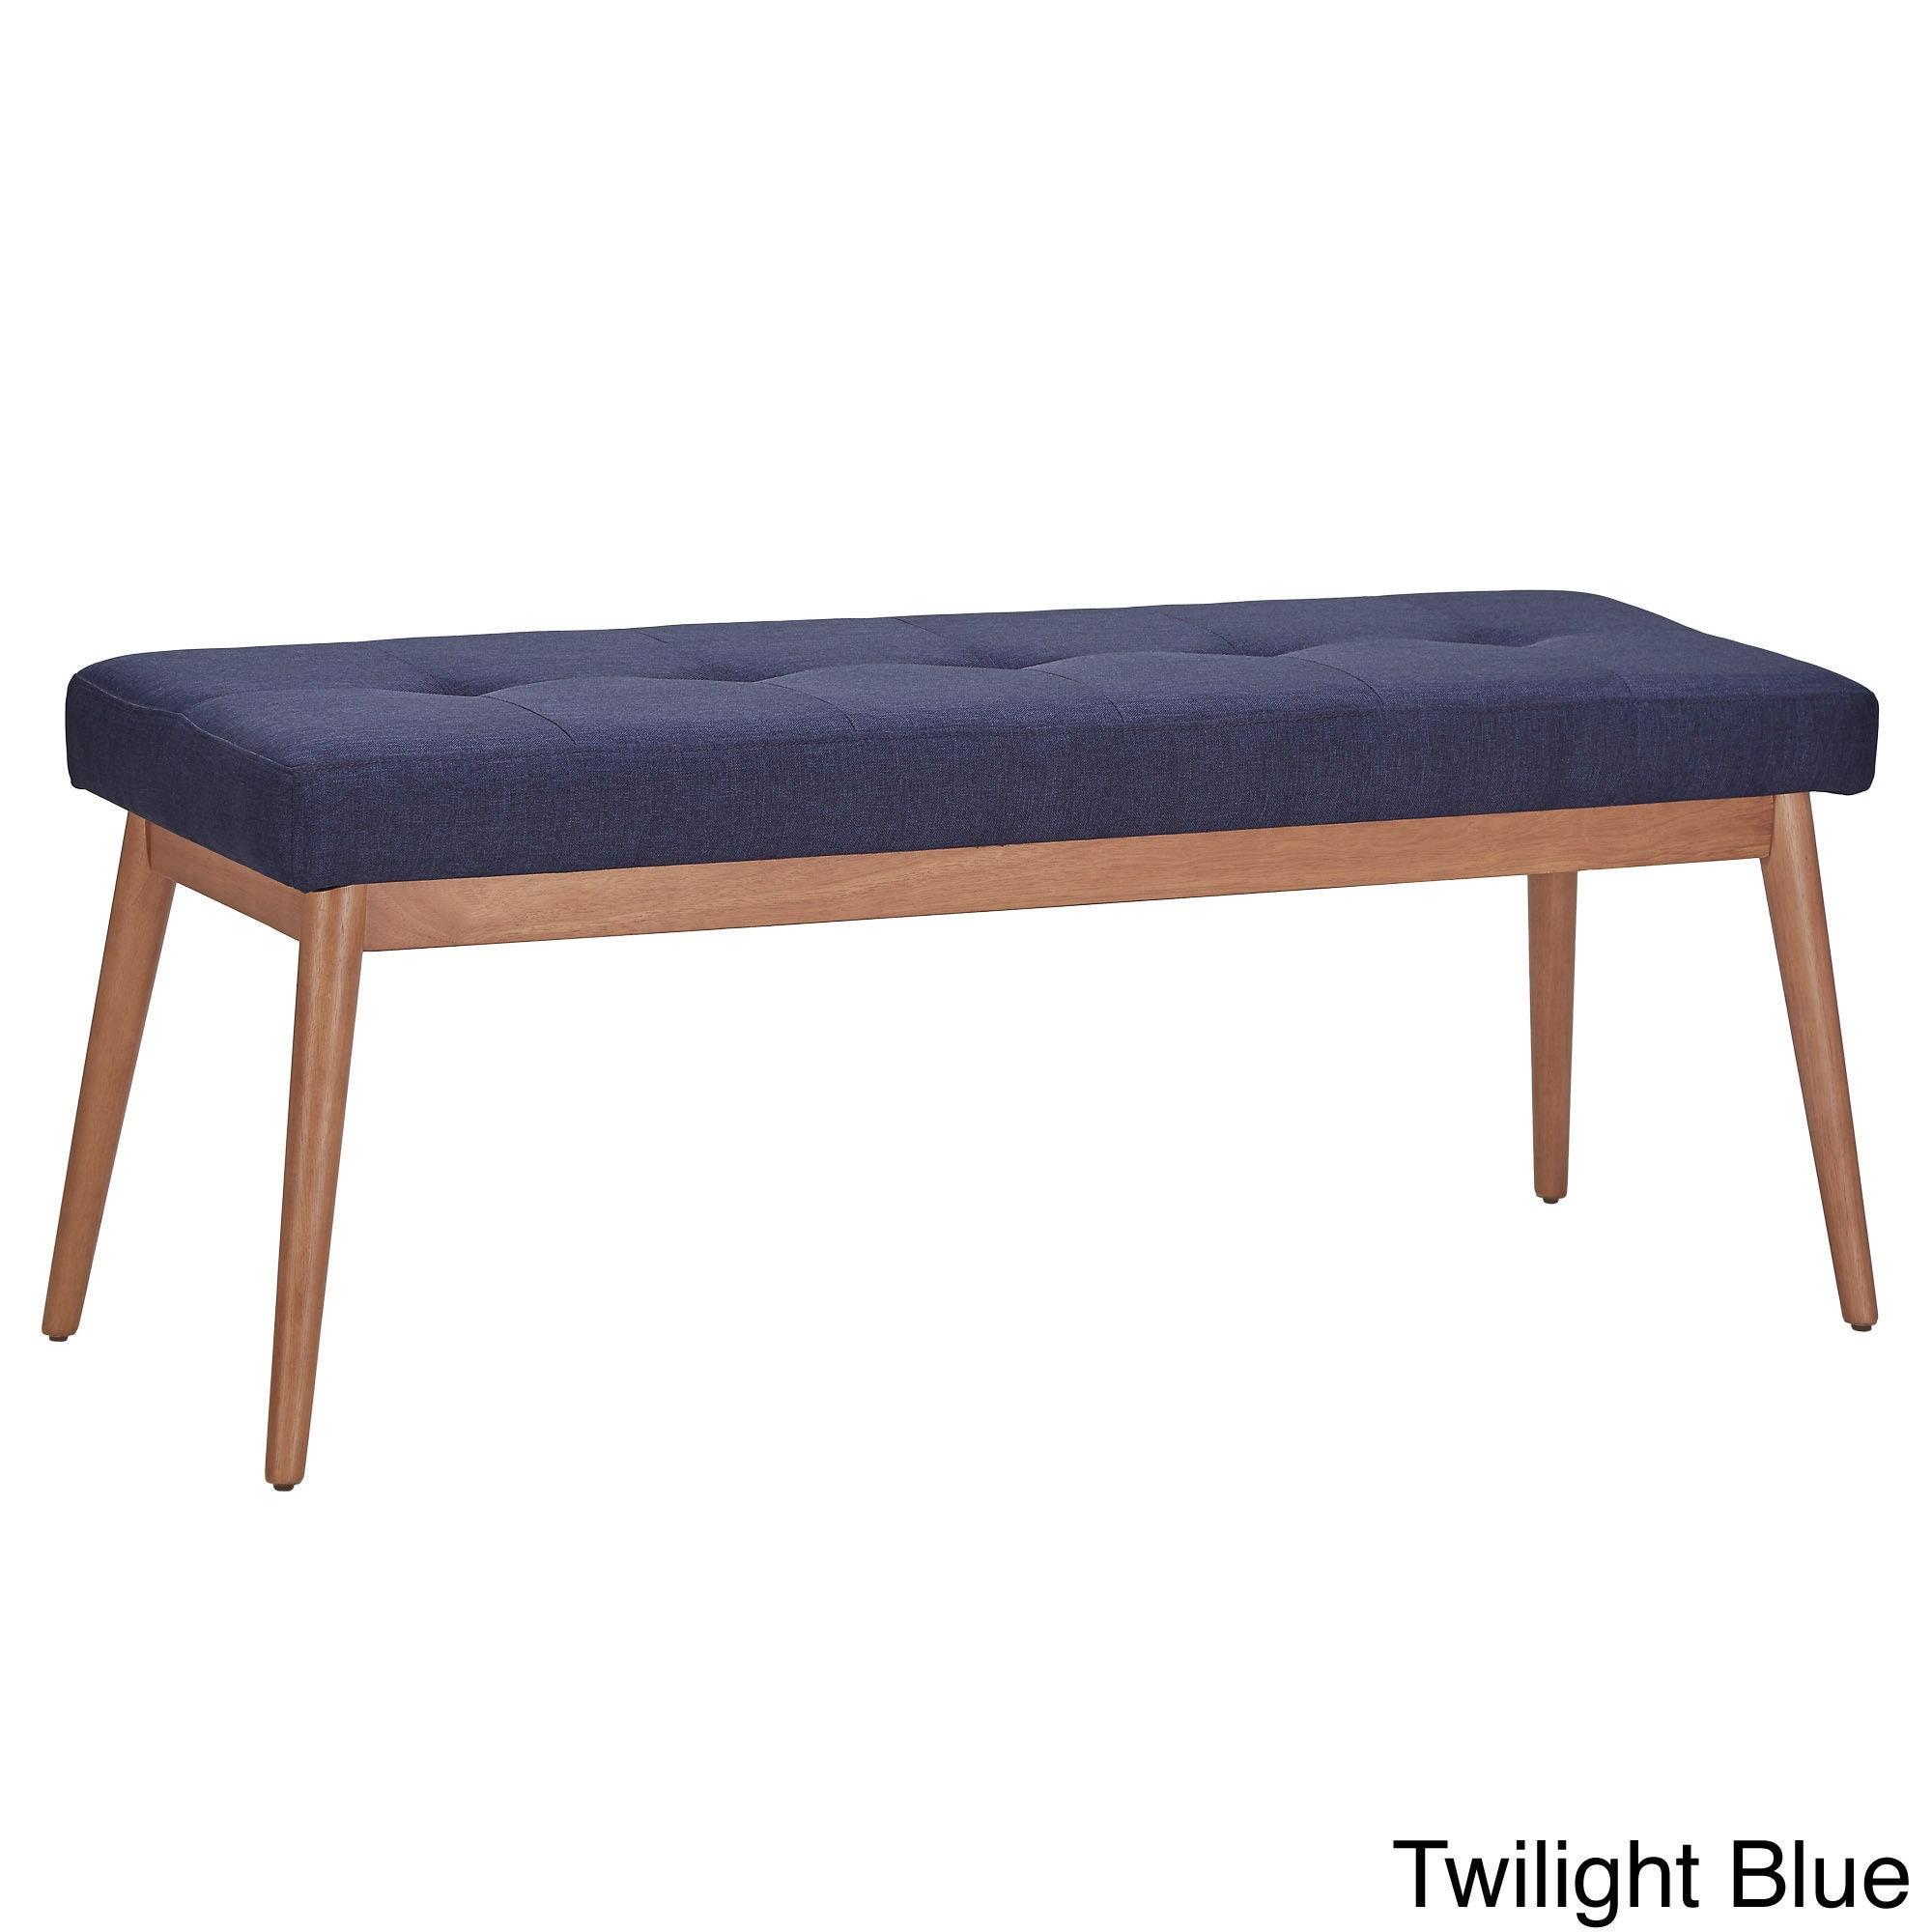 Sasha Oak Angled Leg Linen Dining Bench iNSPIRE Q Modern - Free Shipping  Today - Overstock.com - 18738979